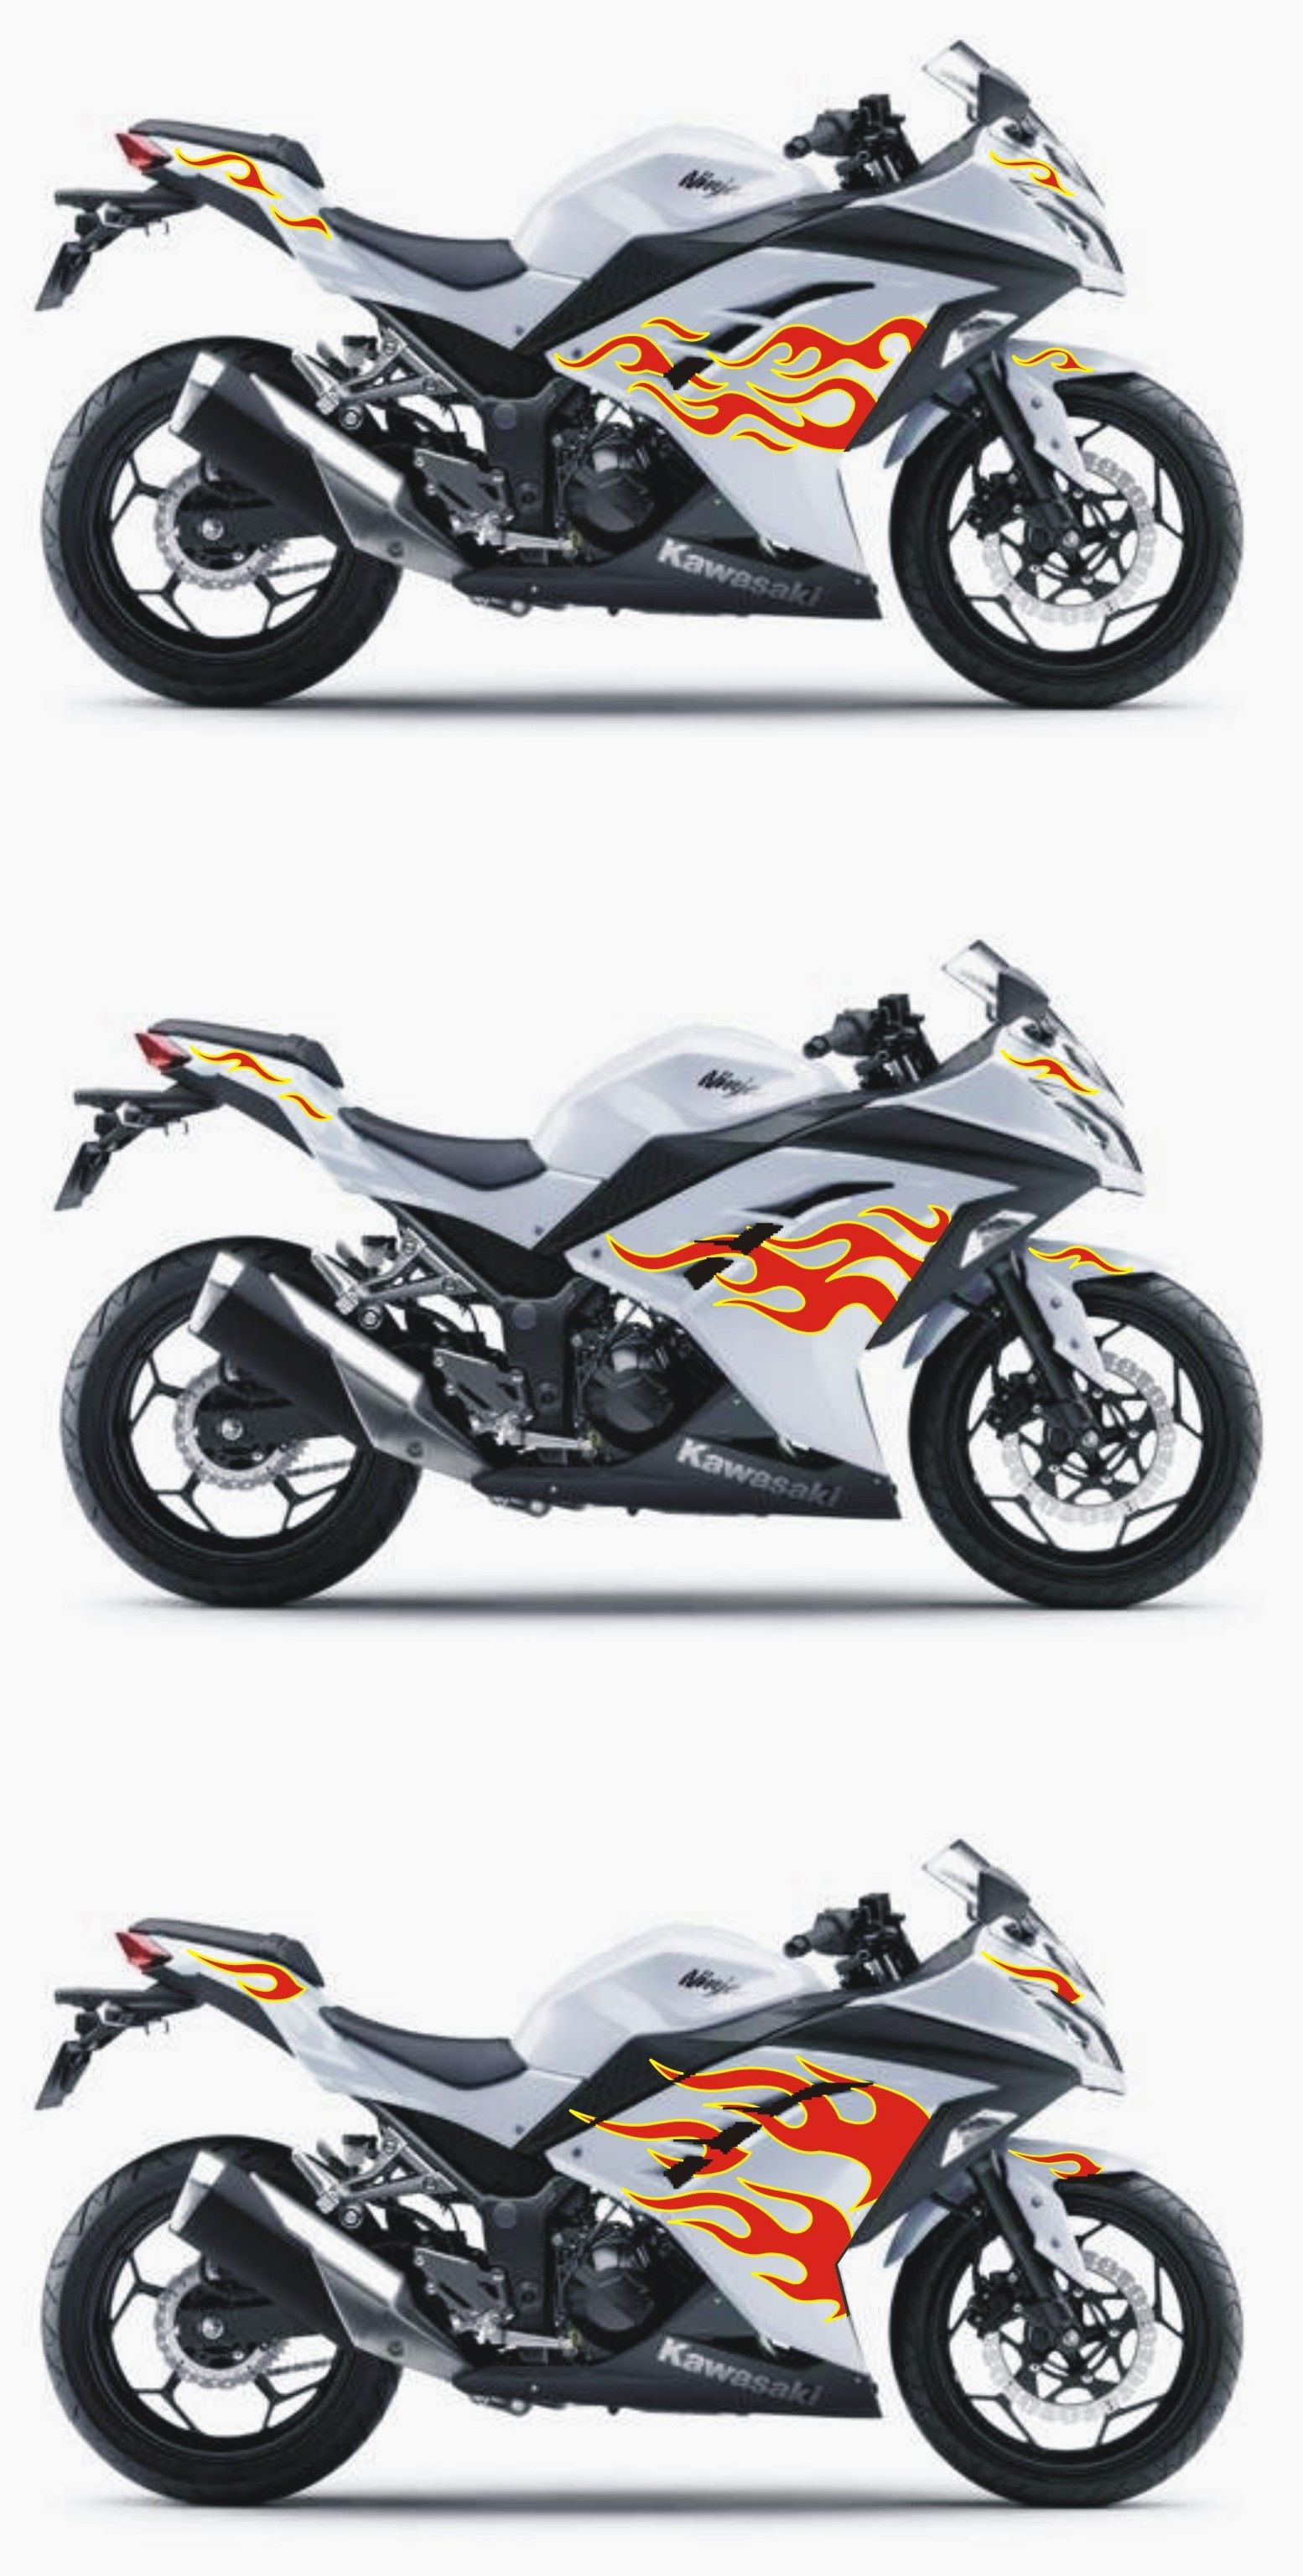 Kawasaki Ninja F Red Yellow Flame Sticker Cutting Arts - Stickers for motorcycles kawasaki